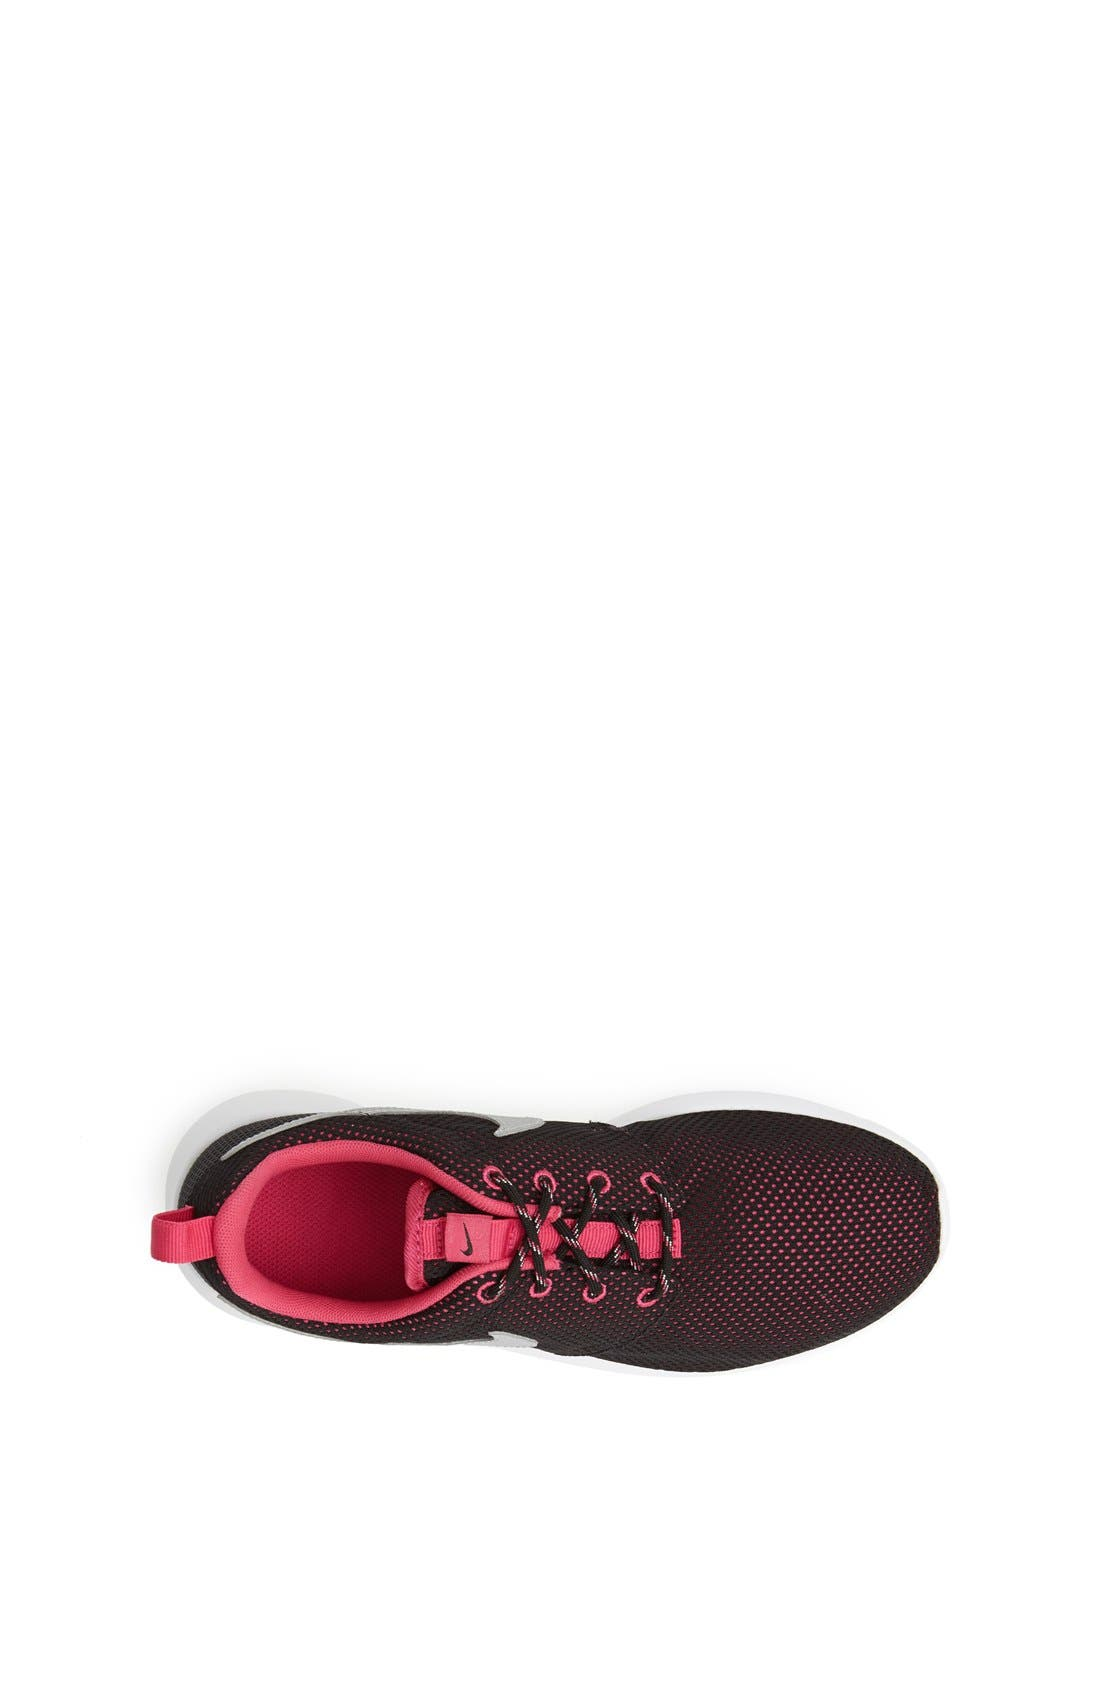 'Roshe Run' Athletic Shoe,                             Alternate thumbnail 153, color,